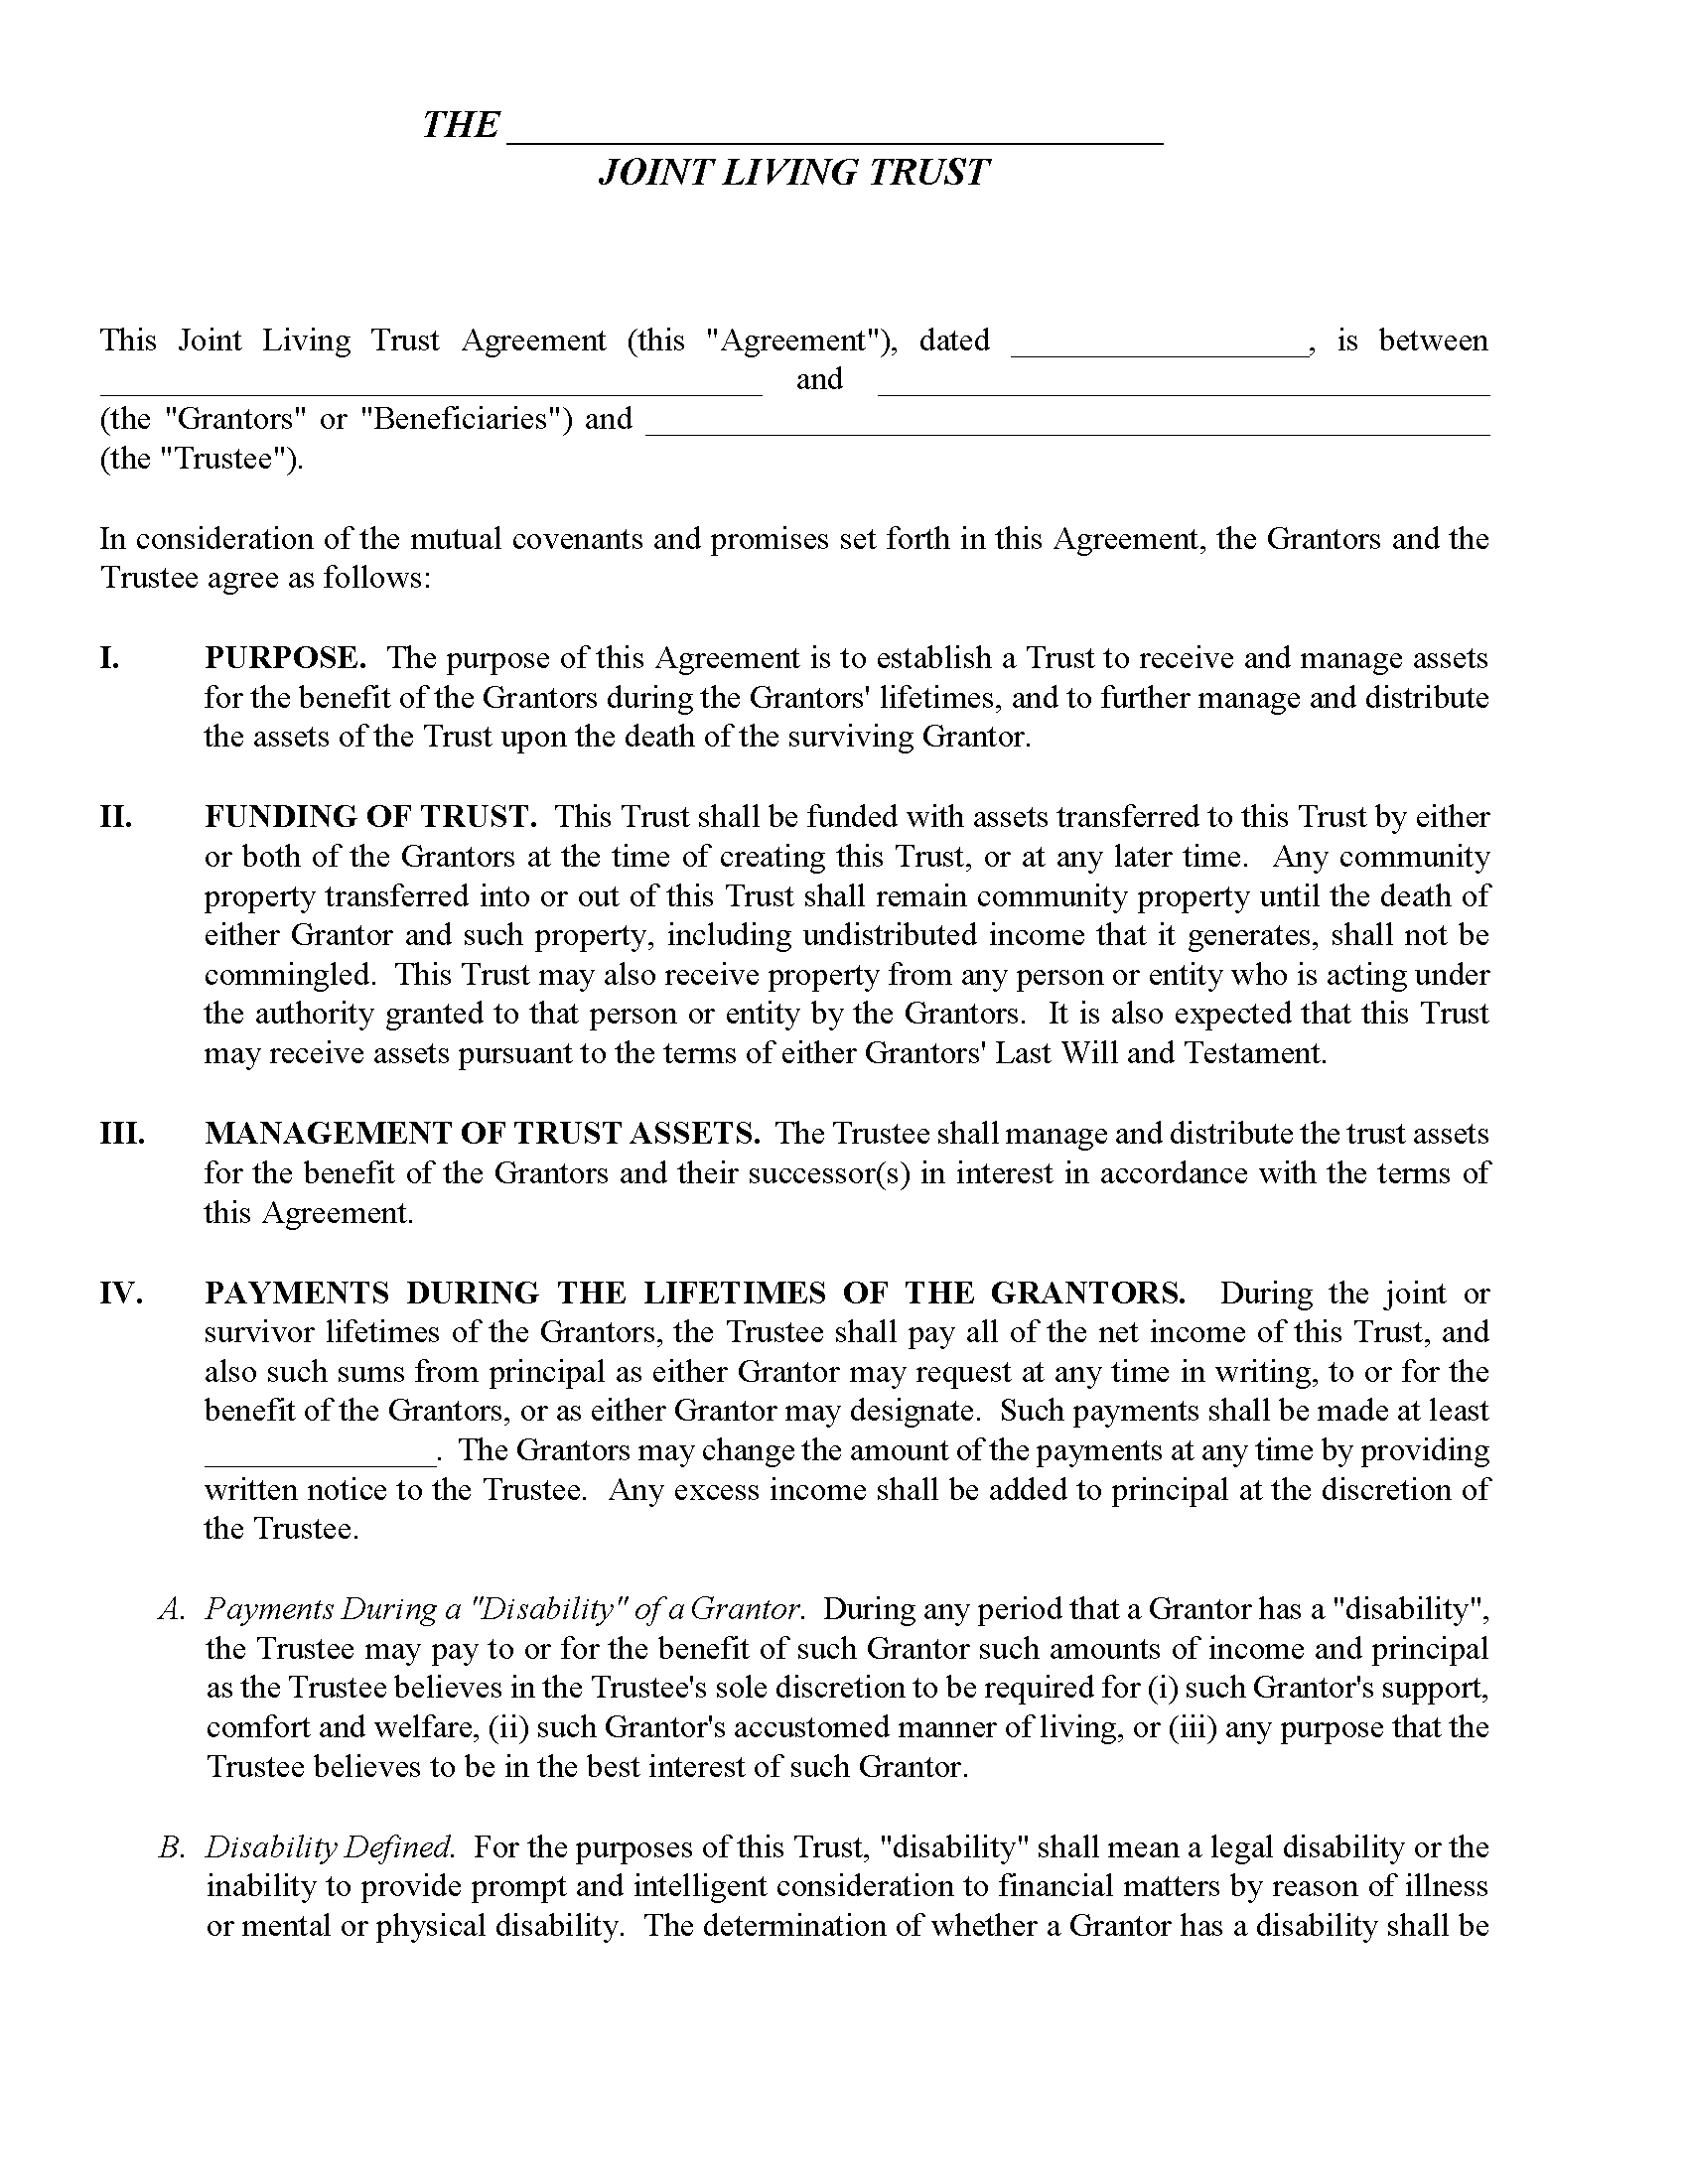 Washington DC Joint Living Trust Form